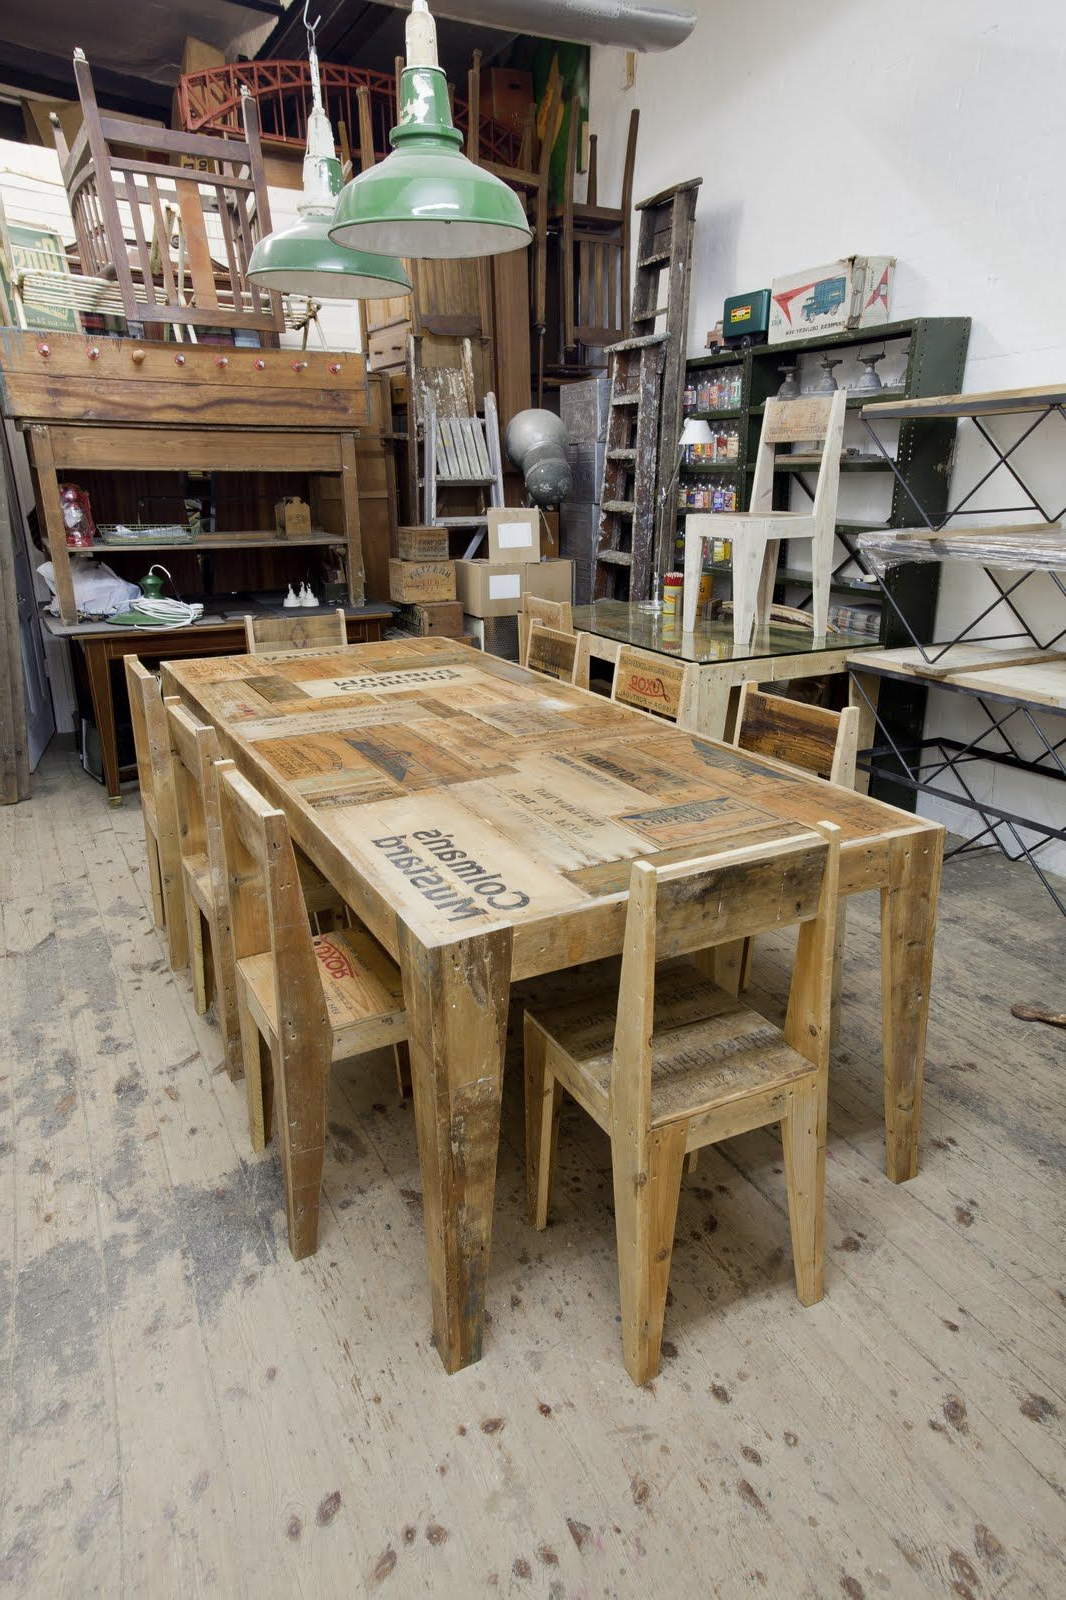 Tables De Segunda Mano Ftd8 Crate Furniture Collection Rupert Blanchard Crea Muebles A Medida